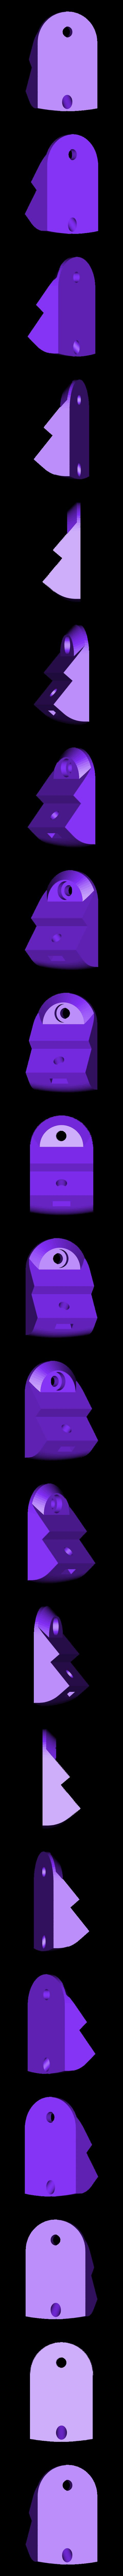 Support Ext Inf.stl Télécharger fichier STL Gyro Winder / Watch Winder / Remontoir Montre • Objet pour impression 3D, NedalLive